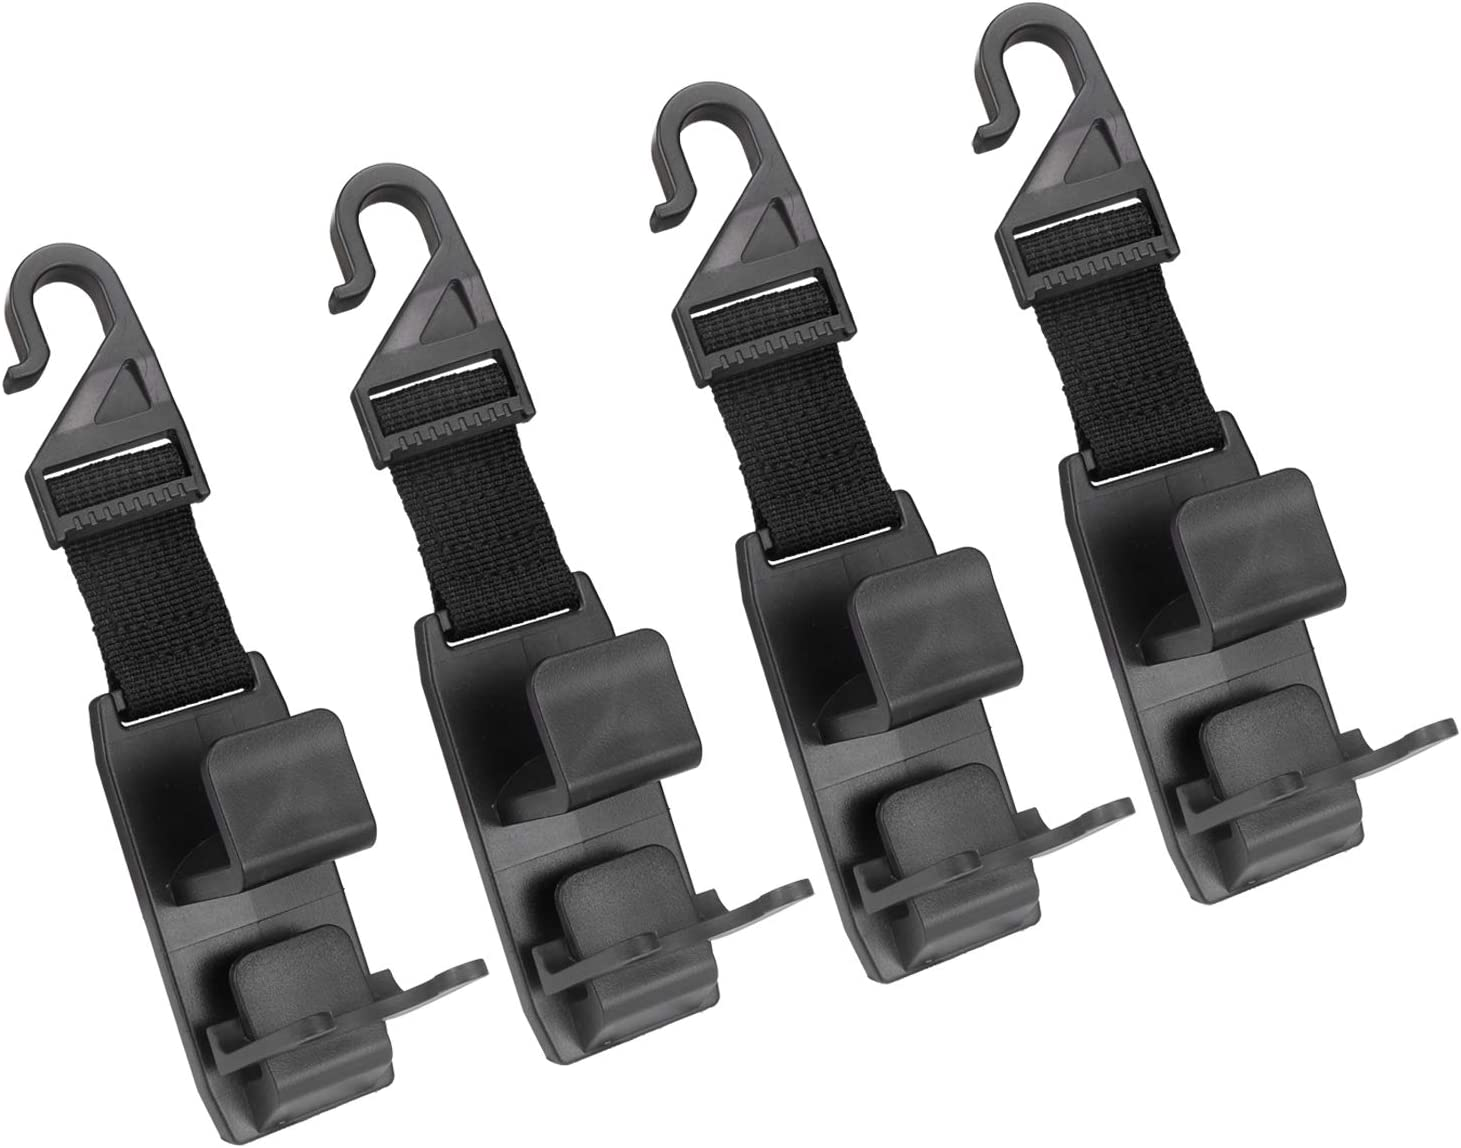 LivTee Black Car Back Seat Headrest Hooks, Car Seat Organizer Accessory for Coats Umbrellas Grocery Bags Handbag & Bottle Holder(4pcs)